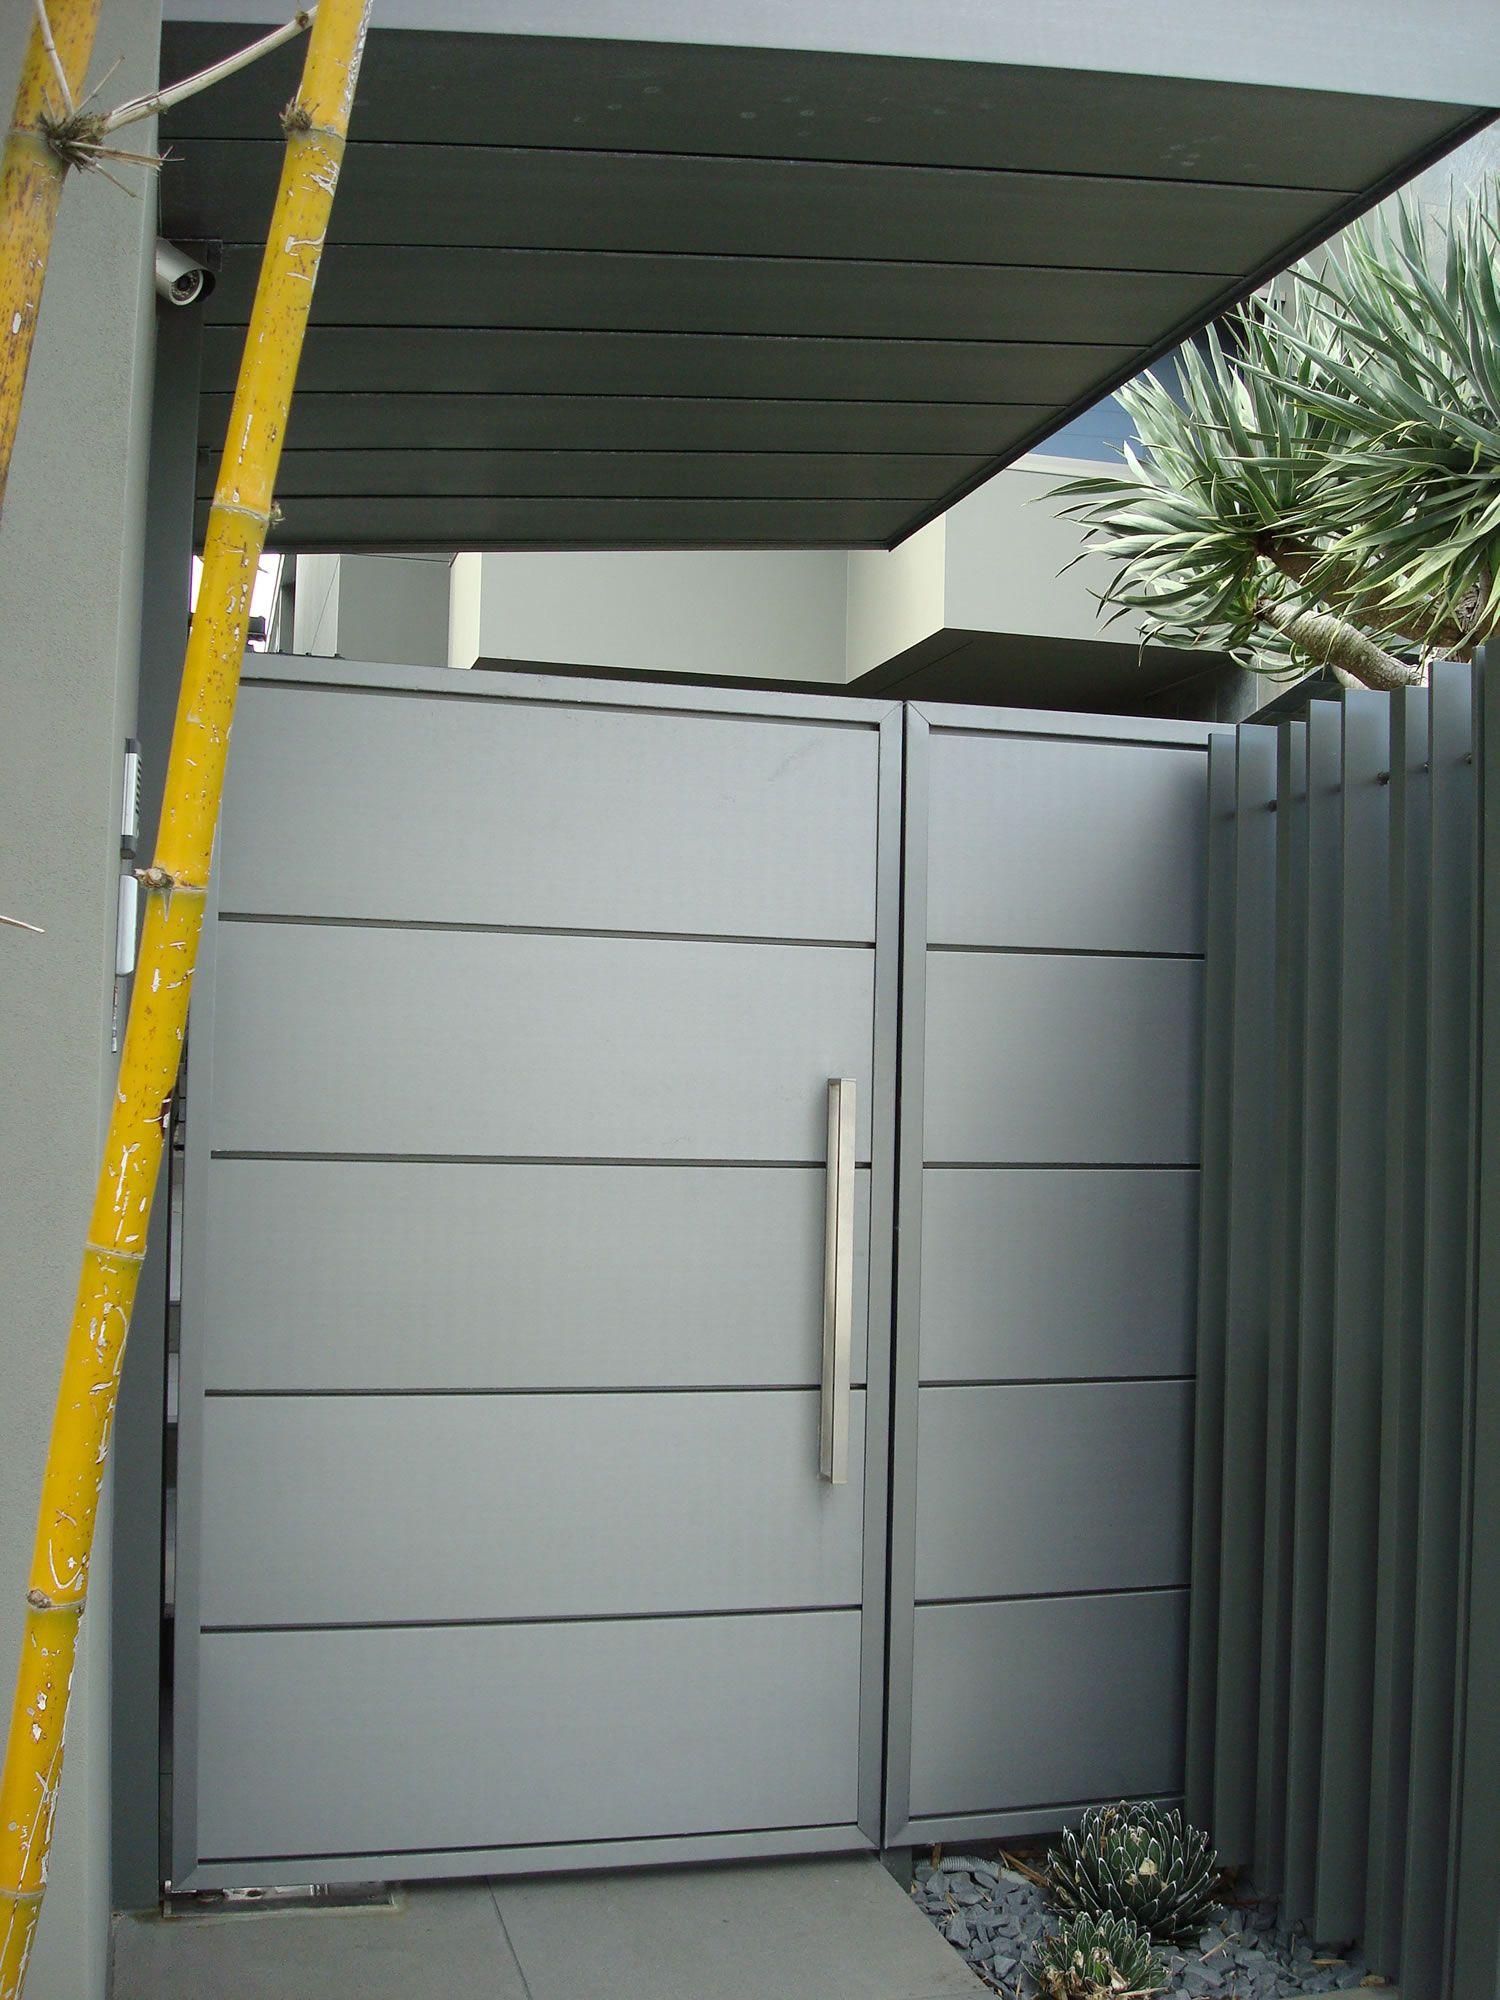 Vm Zinc Quartz Horizontal Interlocking Panels Pedestrian Gate Gold